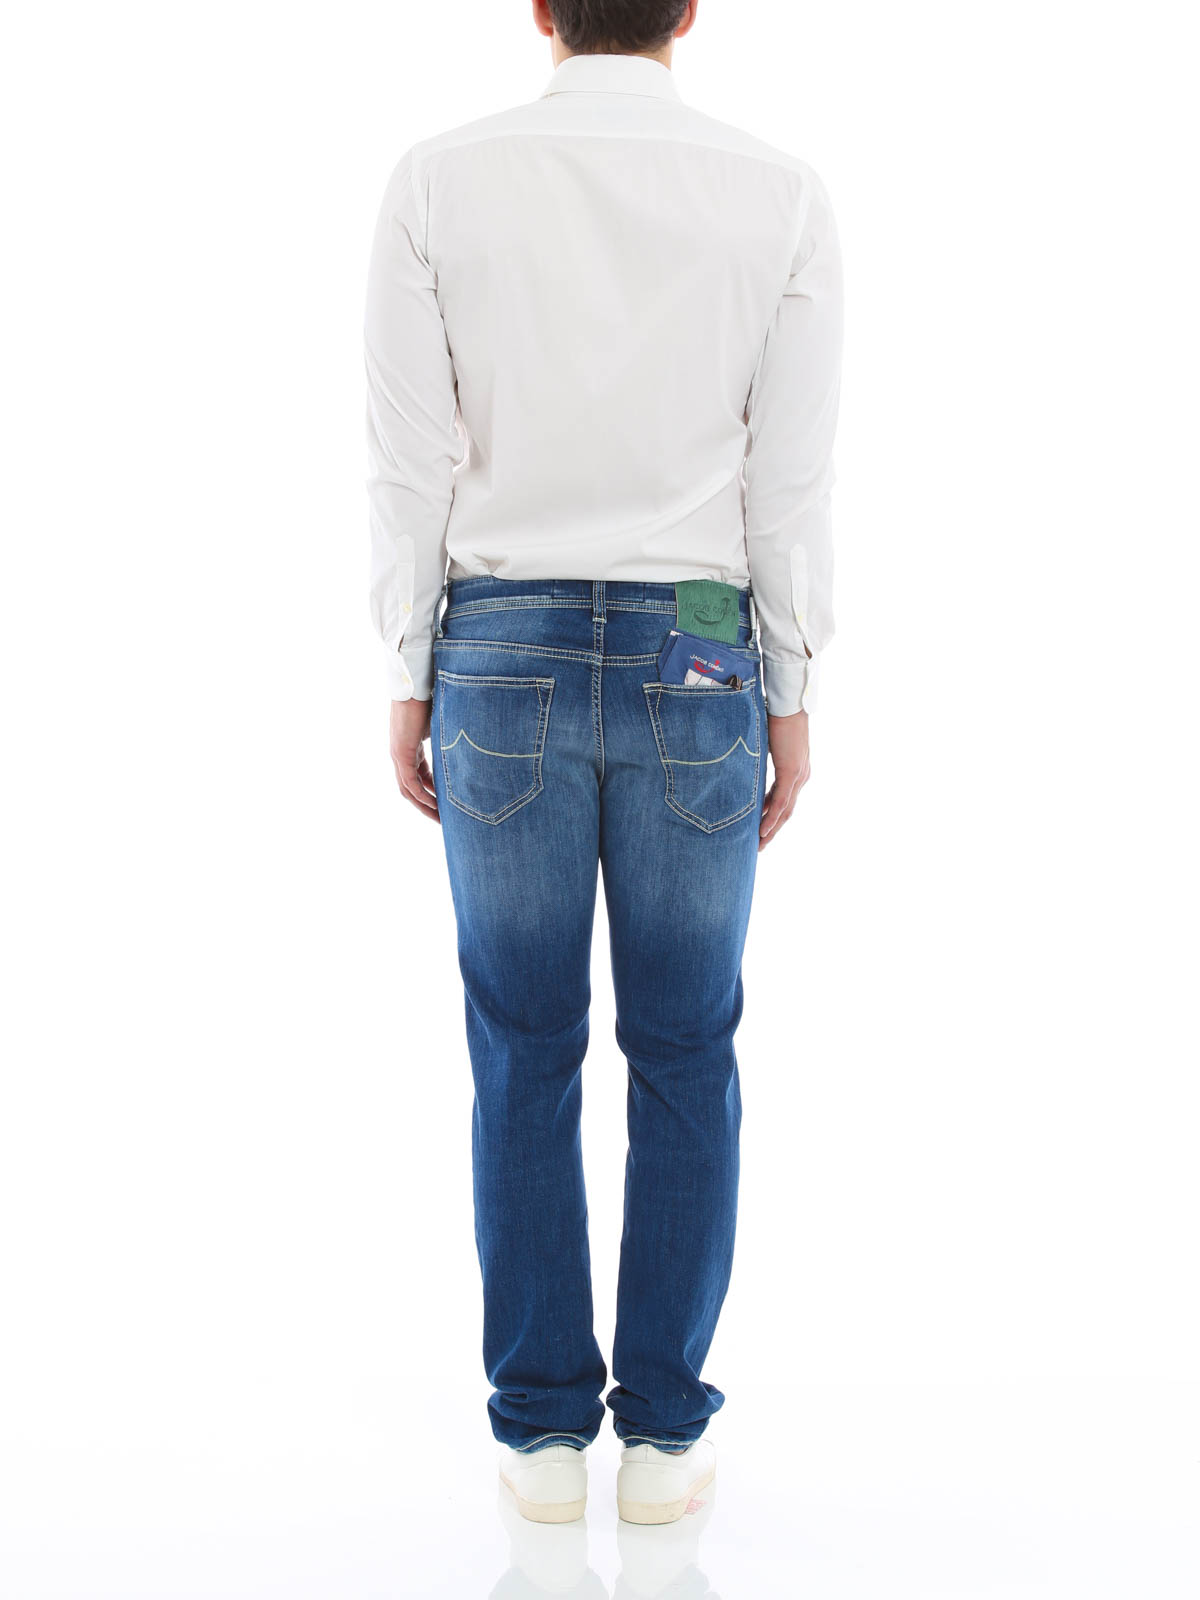 j688 comf jeans by jacob cohen straight leg jeans ikrix. Black Bedroom Furniture Sets. Home Design Ideas